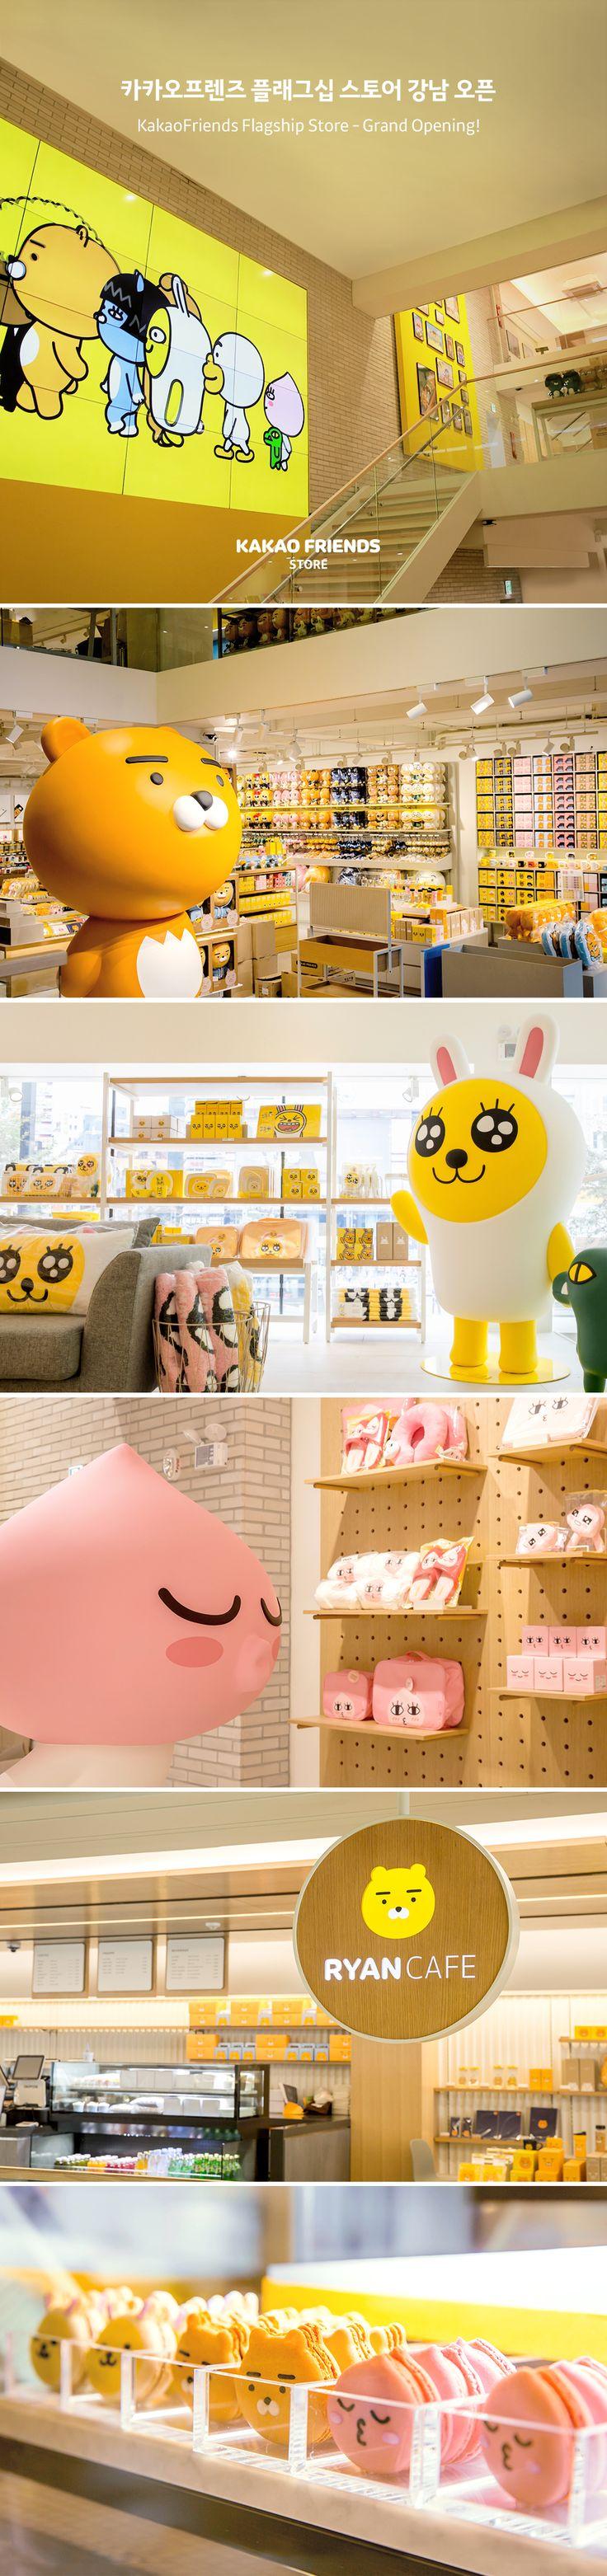 Kakao friends Store